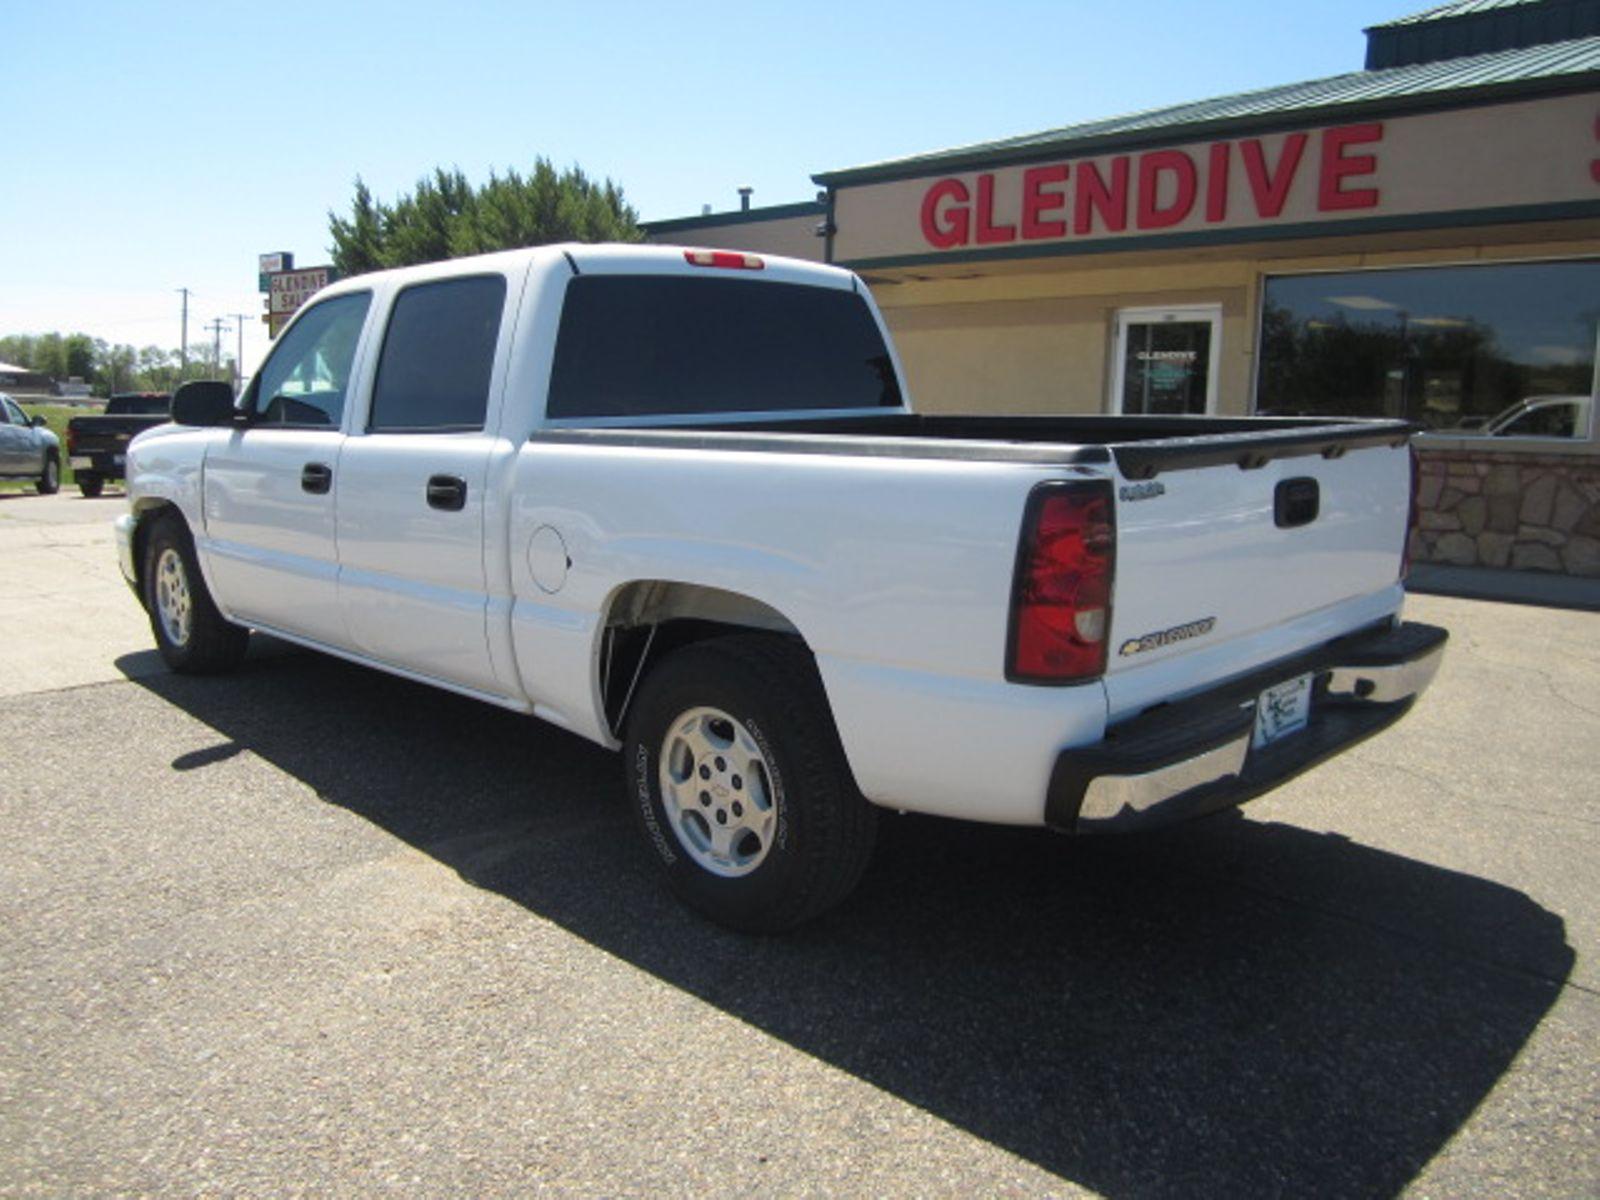 2004 Chevrolet Silverado 1500 LS Glendive MT Glendive Sales Corp